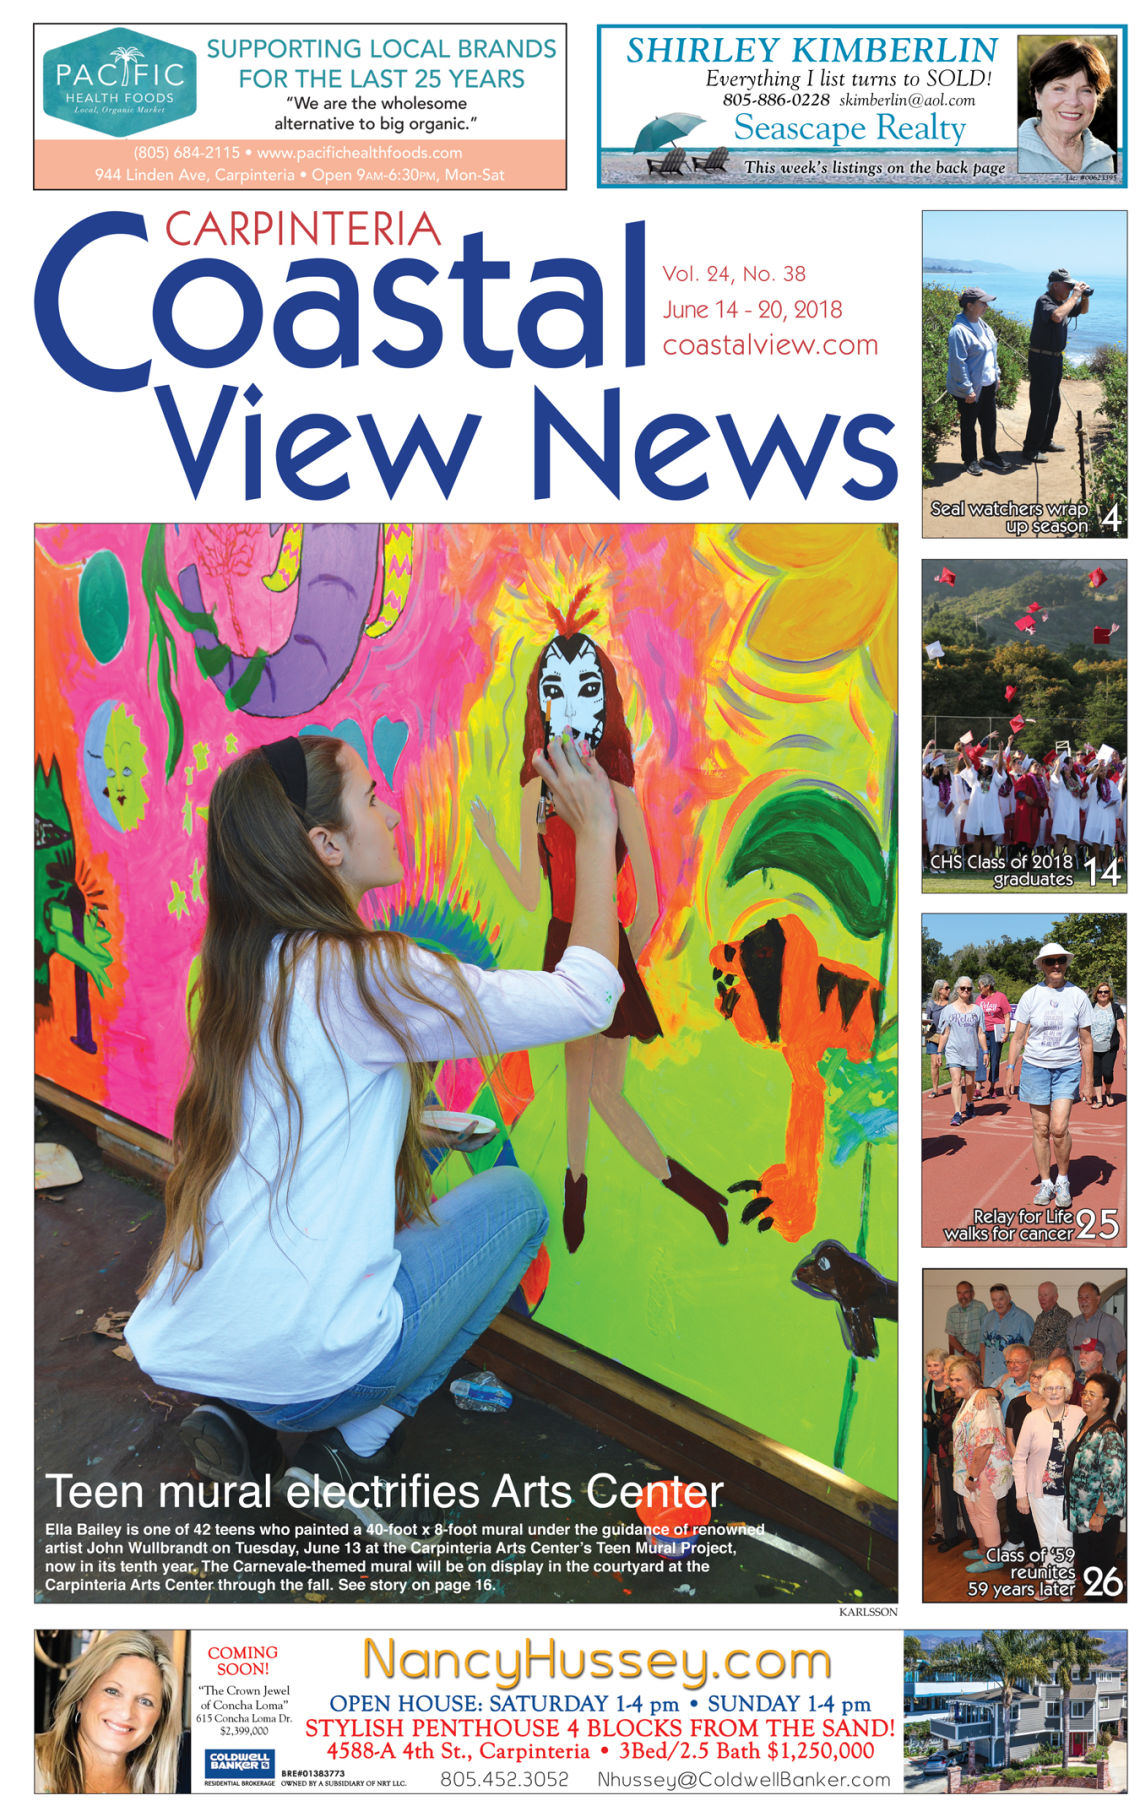 Coastal View News • June 14, 2018